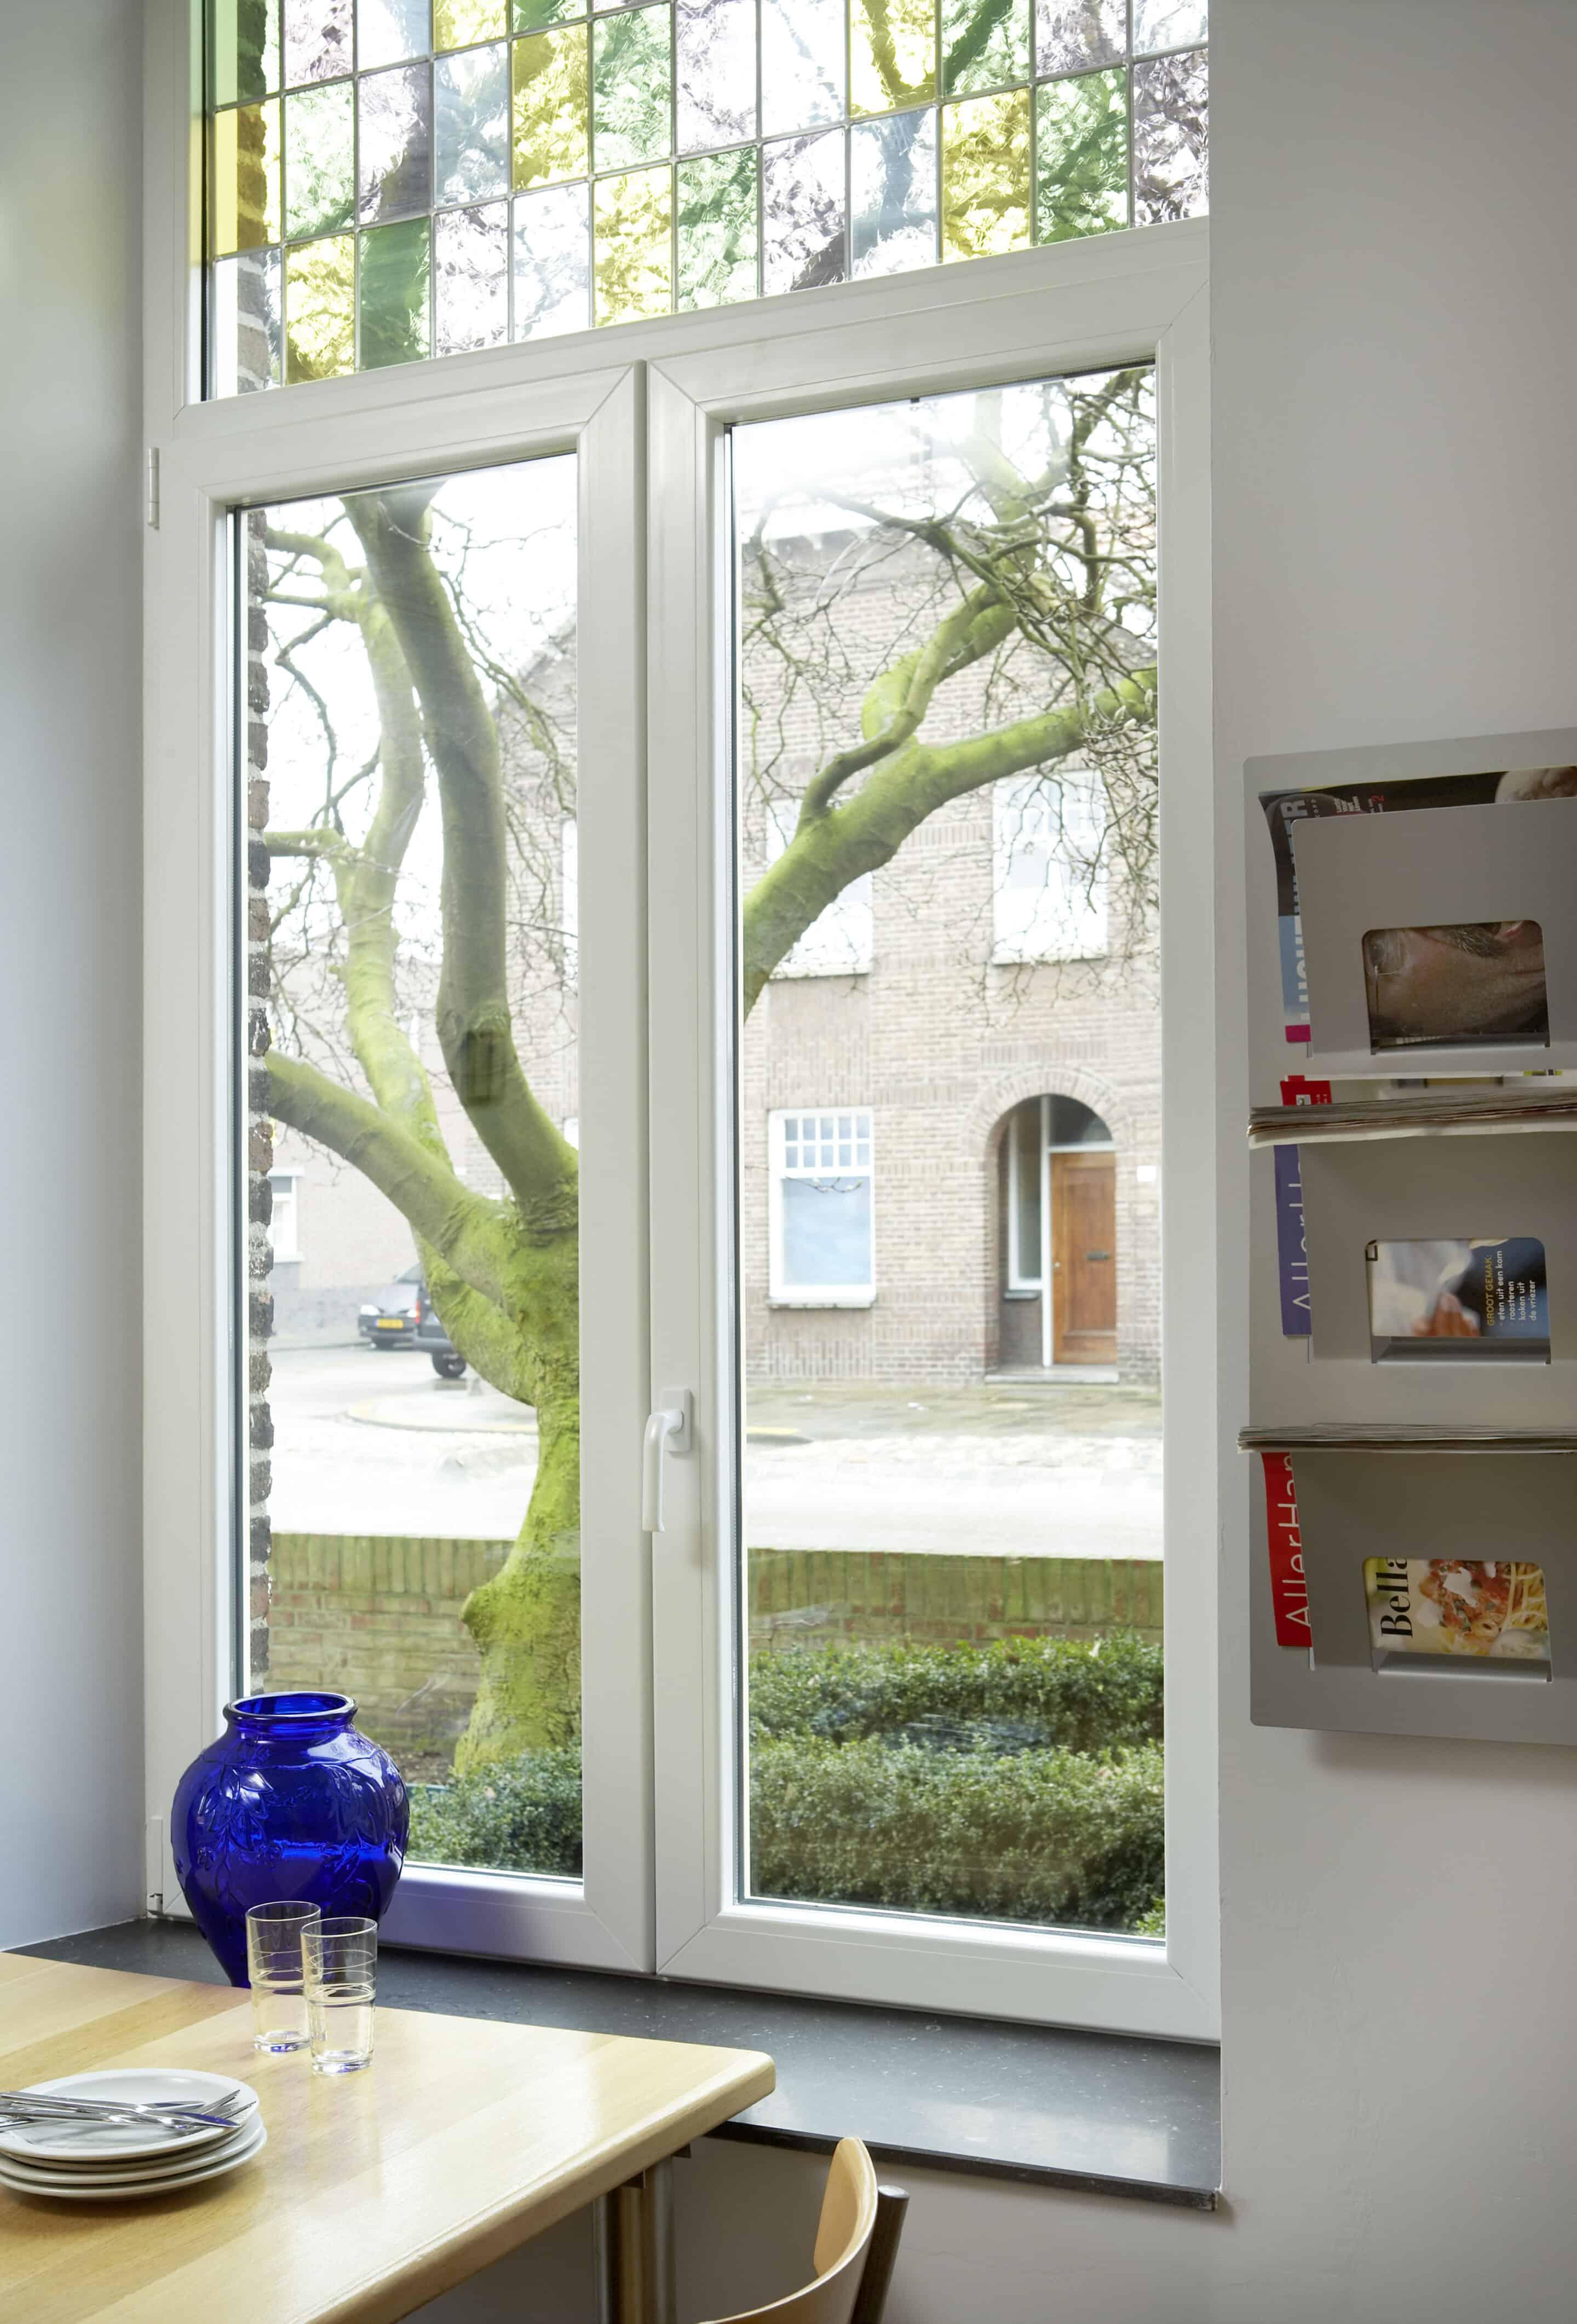 Finestre firenze porte finestre pvc finestre legno - Finestre pvc firenze ...